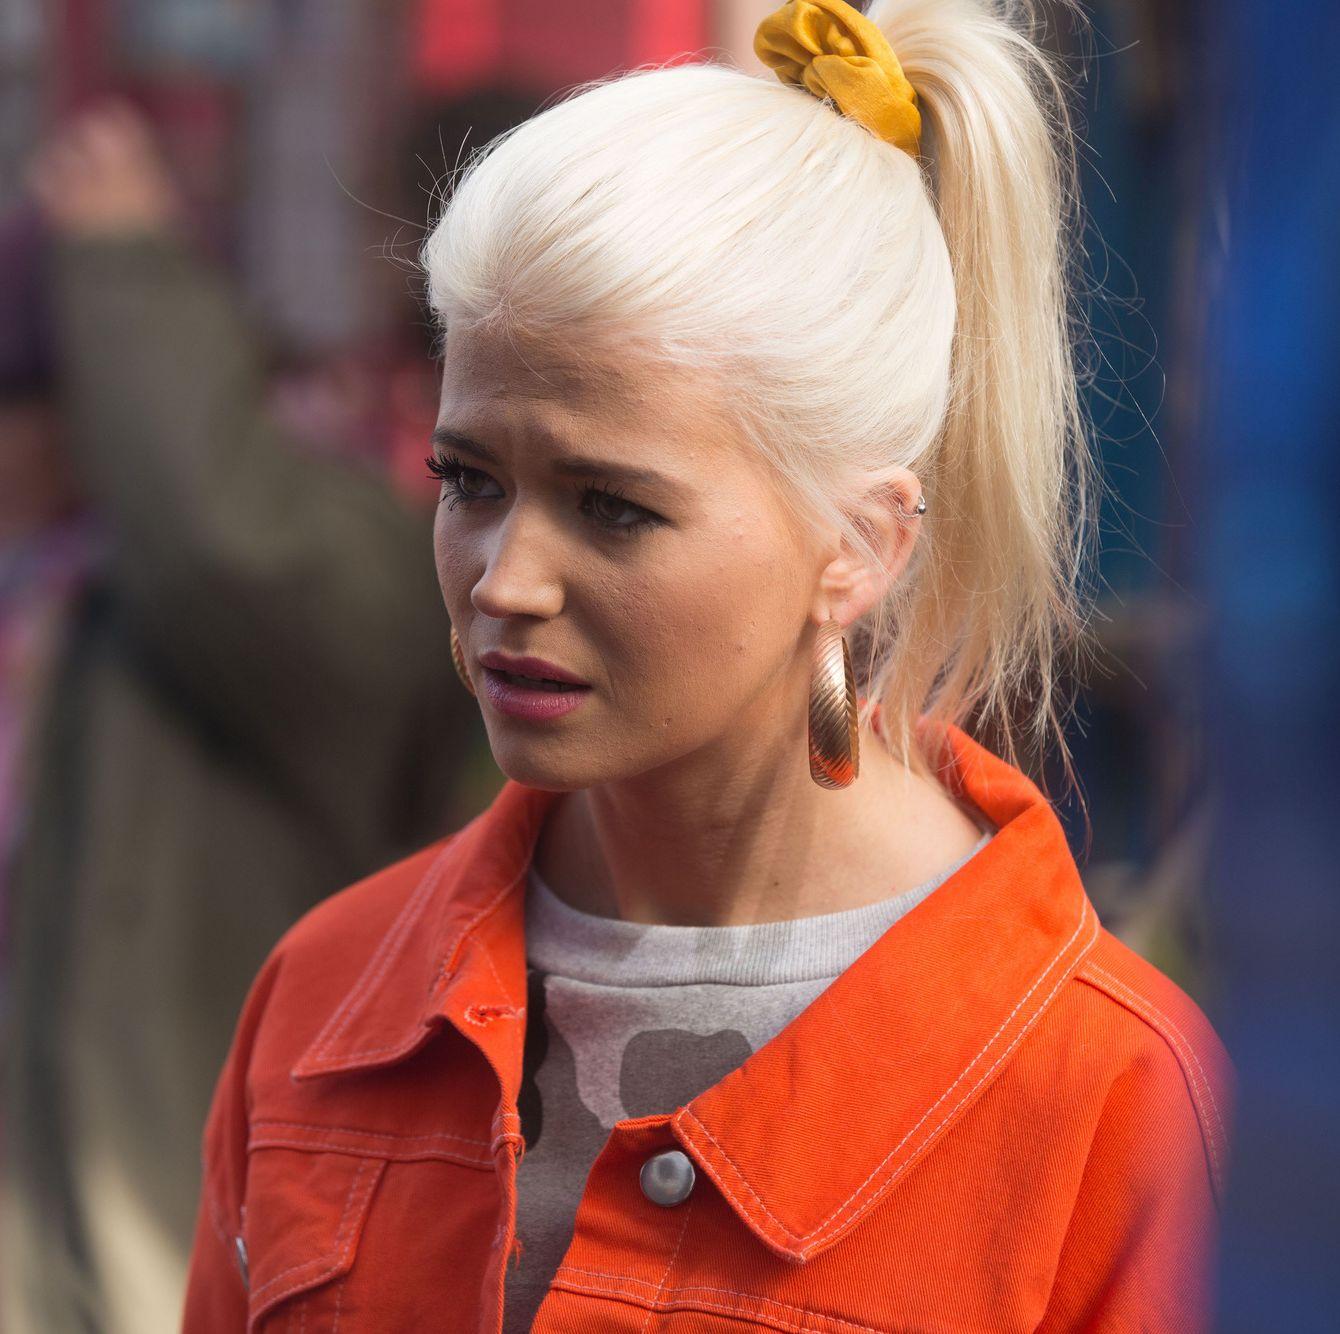 EastEnders' Lola Pearce plans revenge on Ruby as she struggles with jealousy over Jay